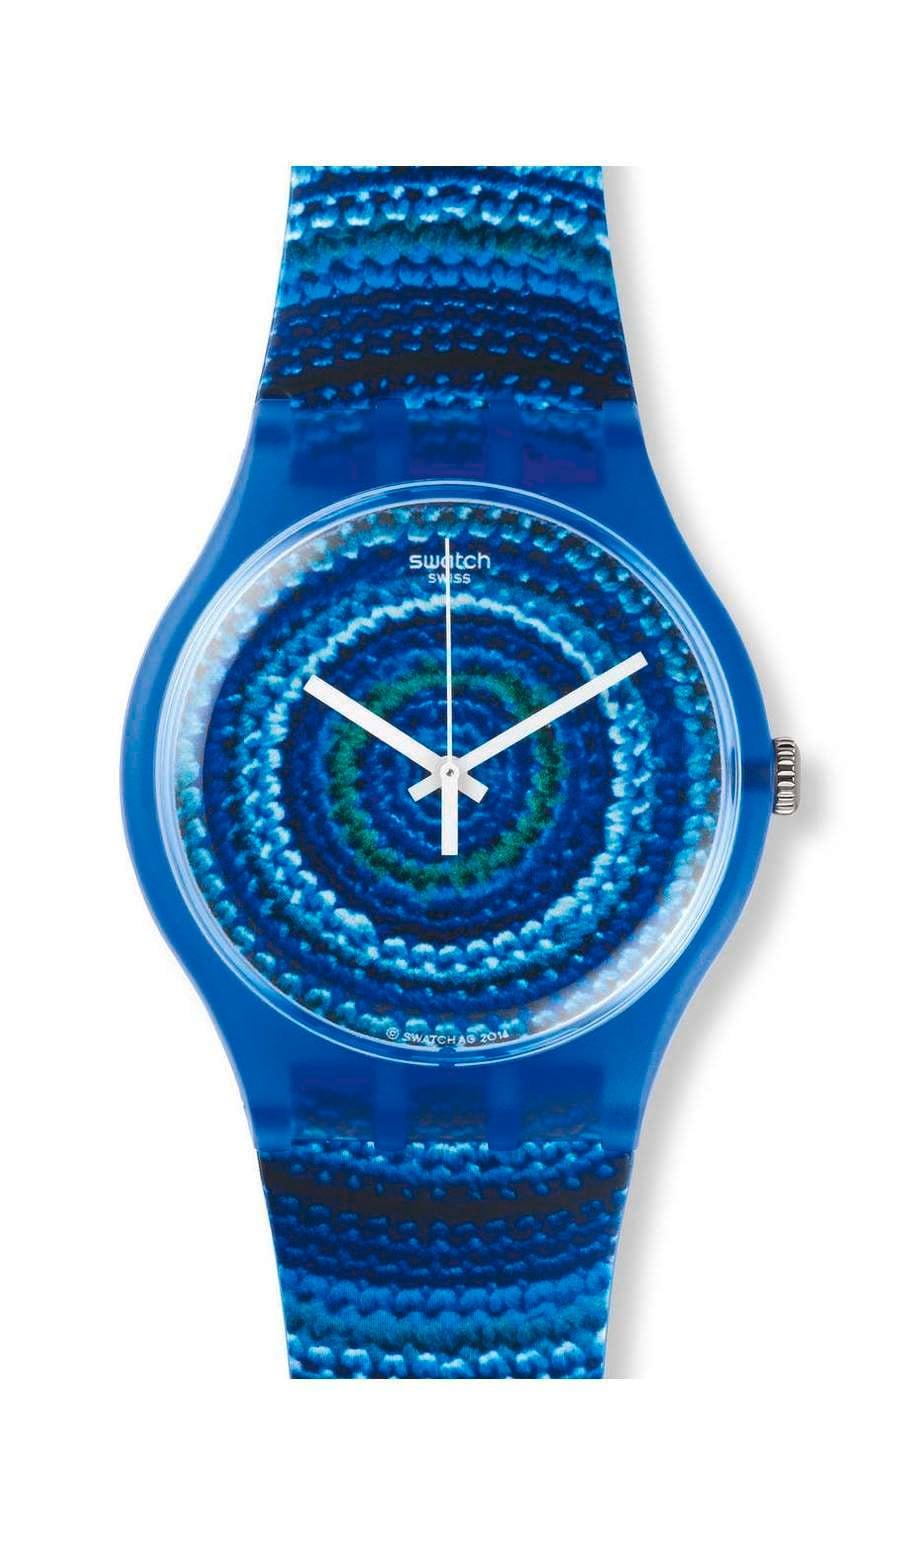 Swatch - CENTRINO - 1